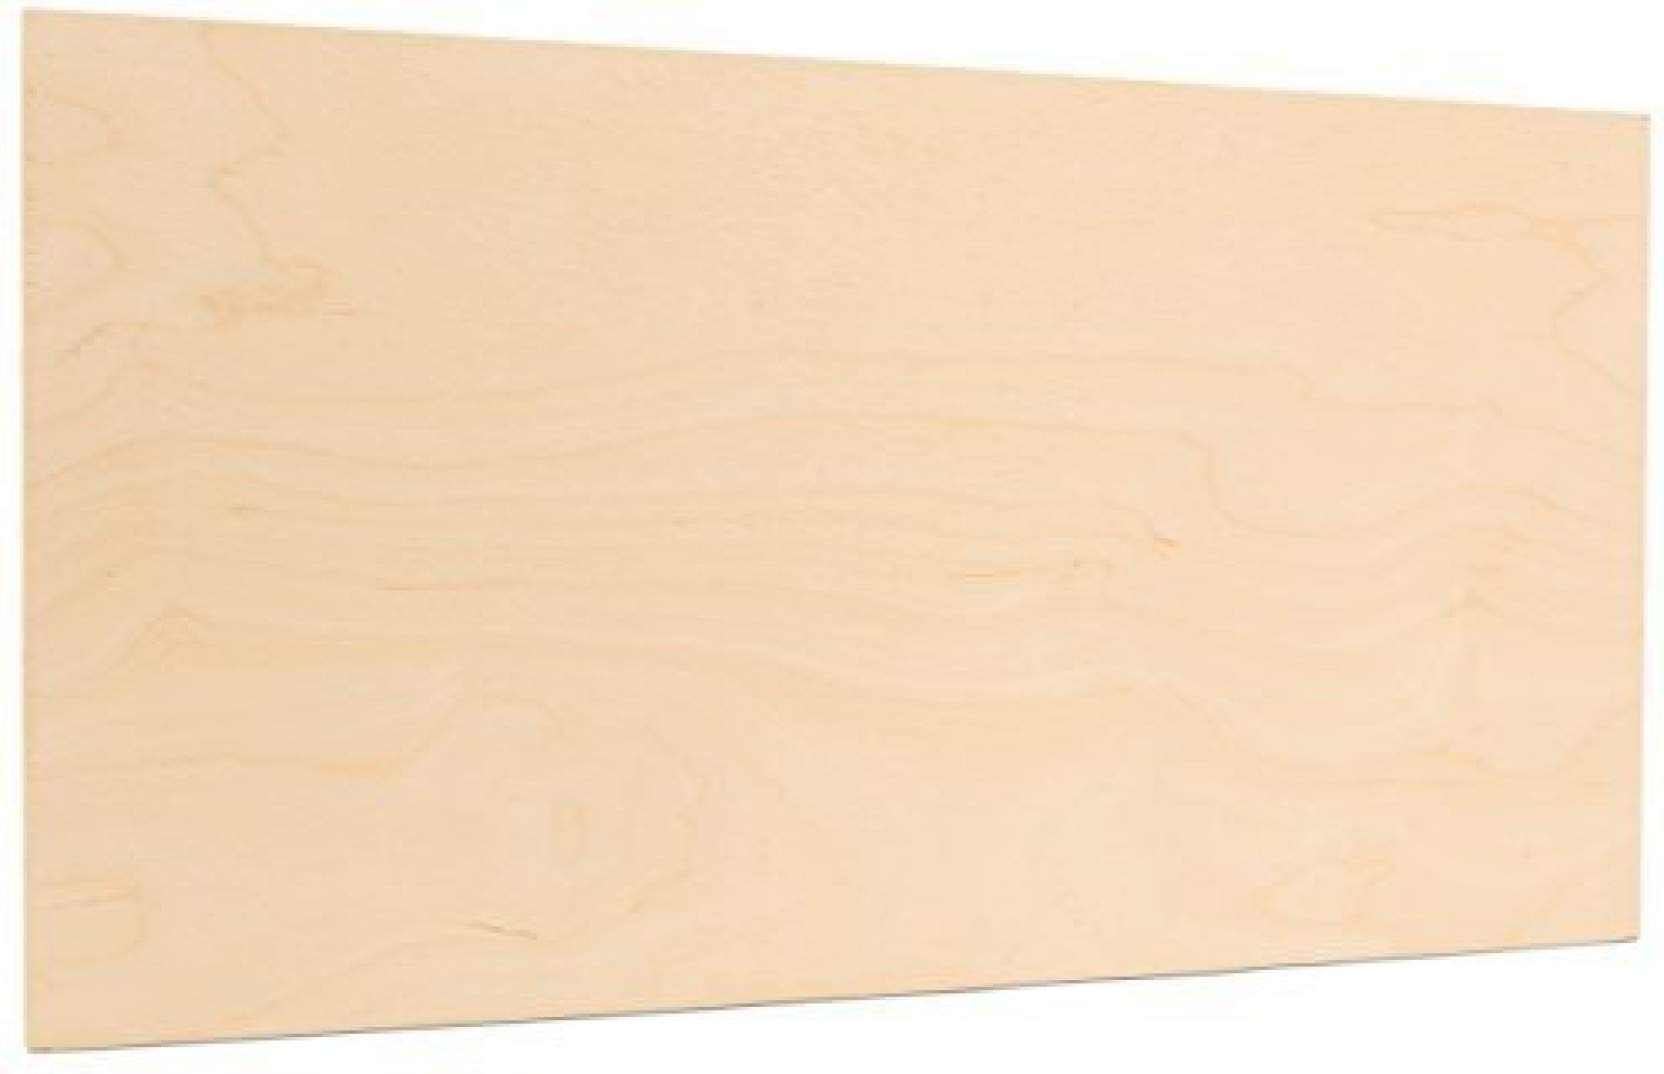 5 mm 1/4'' x 12'' x 24'' Premium Baltic Birch Plywood B/BB Grade (6 Pack) by Wood-Ever